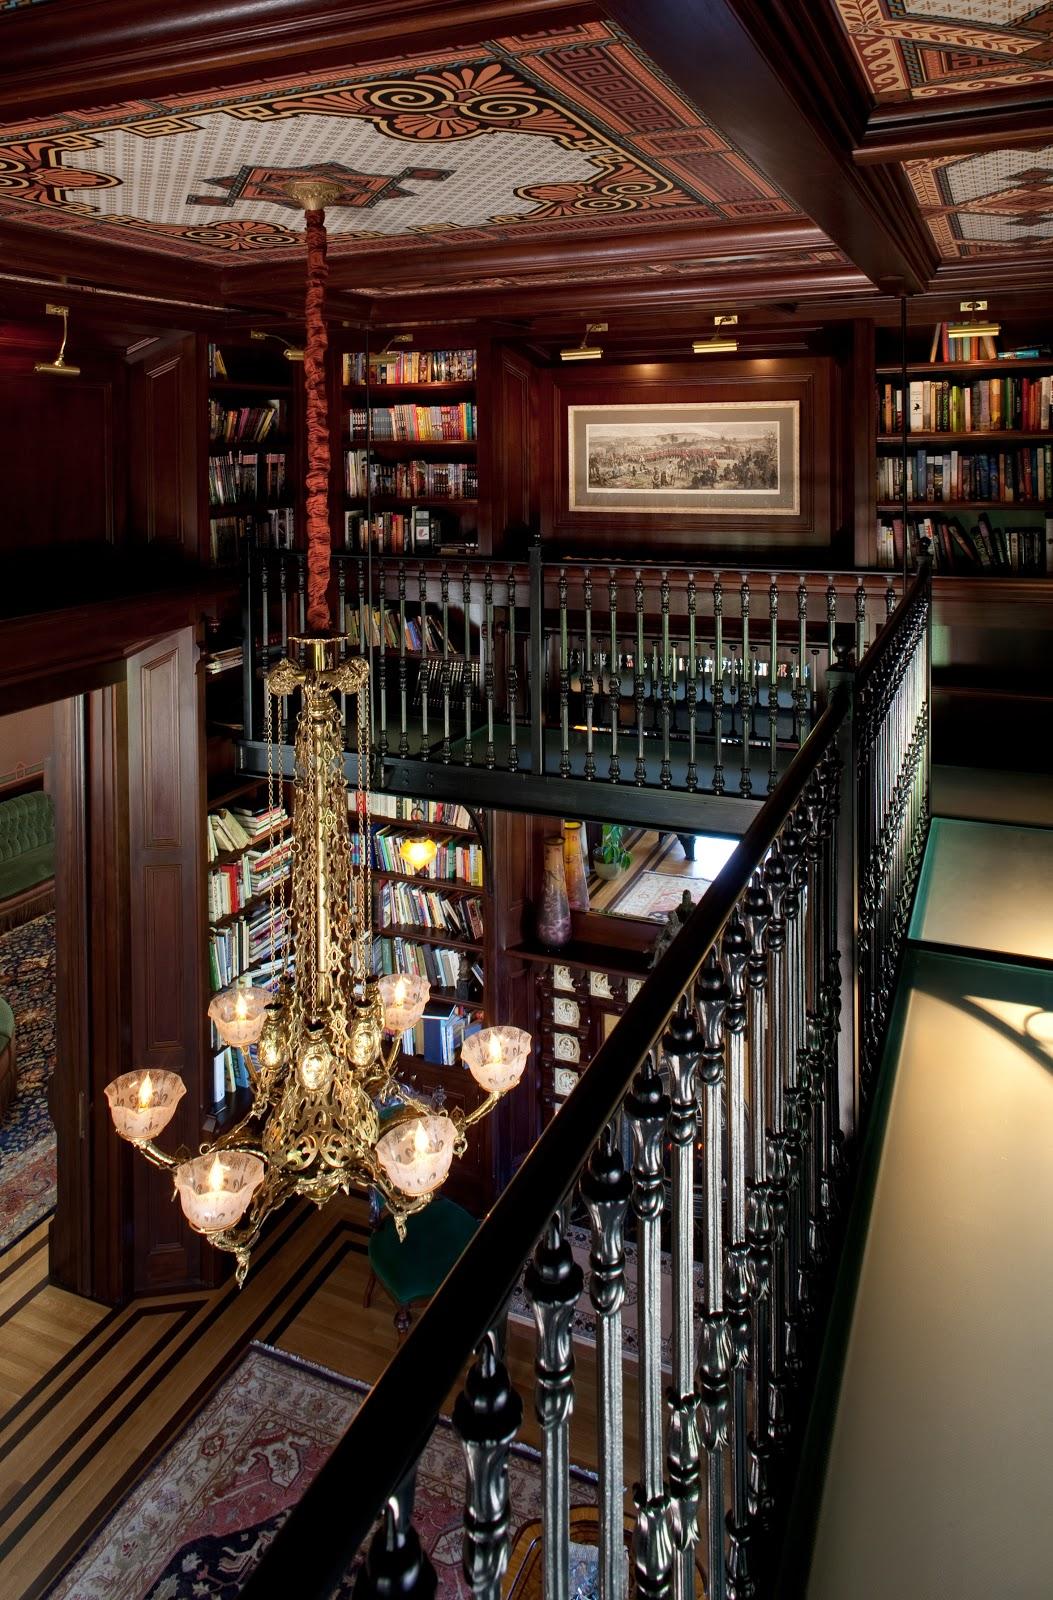 Artistic License News McDonald Mansion The formal interiors at